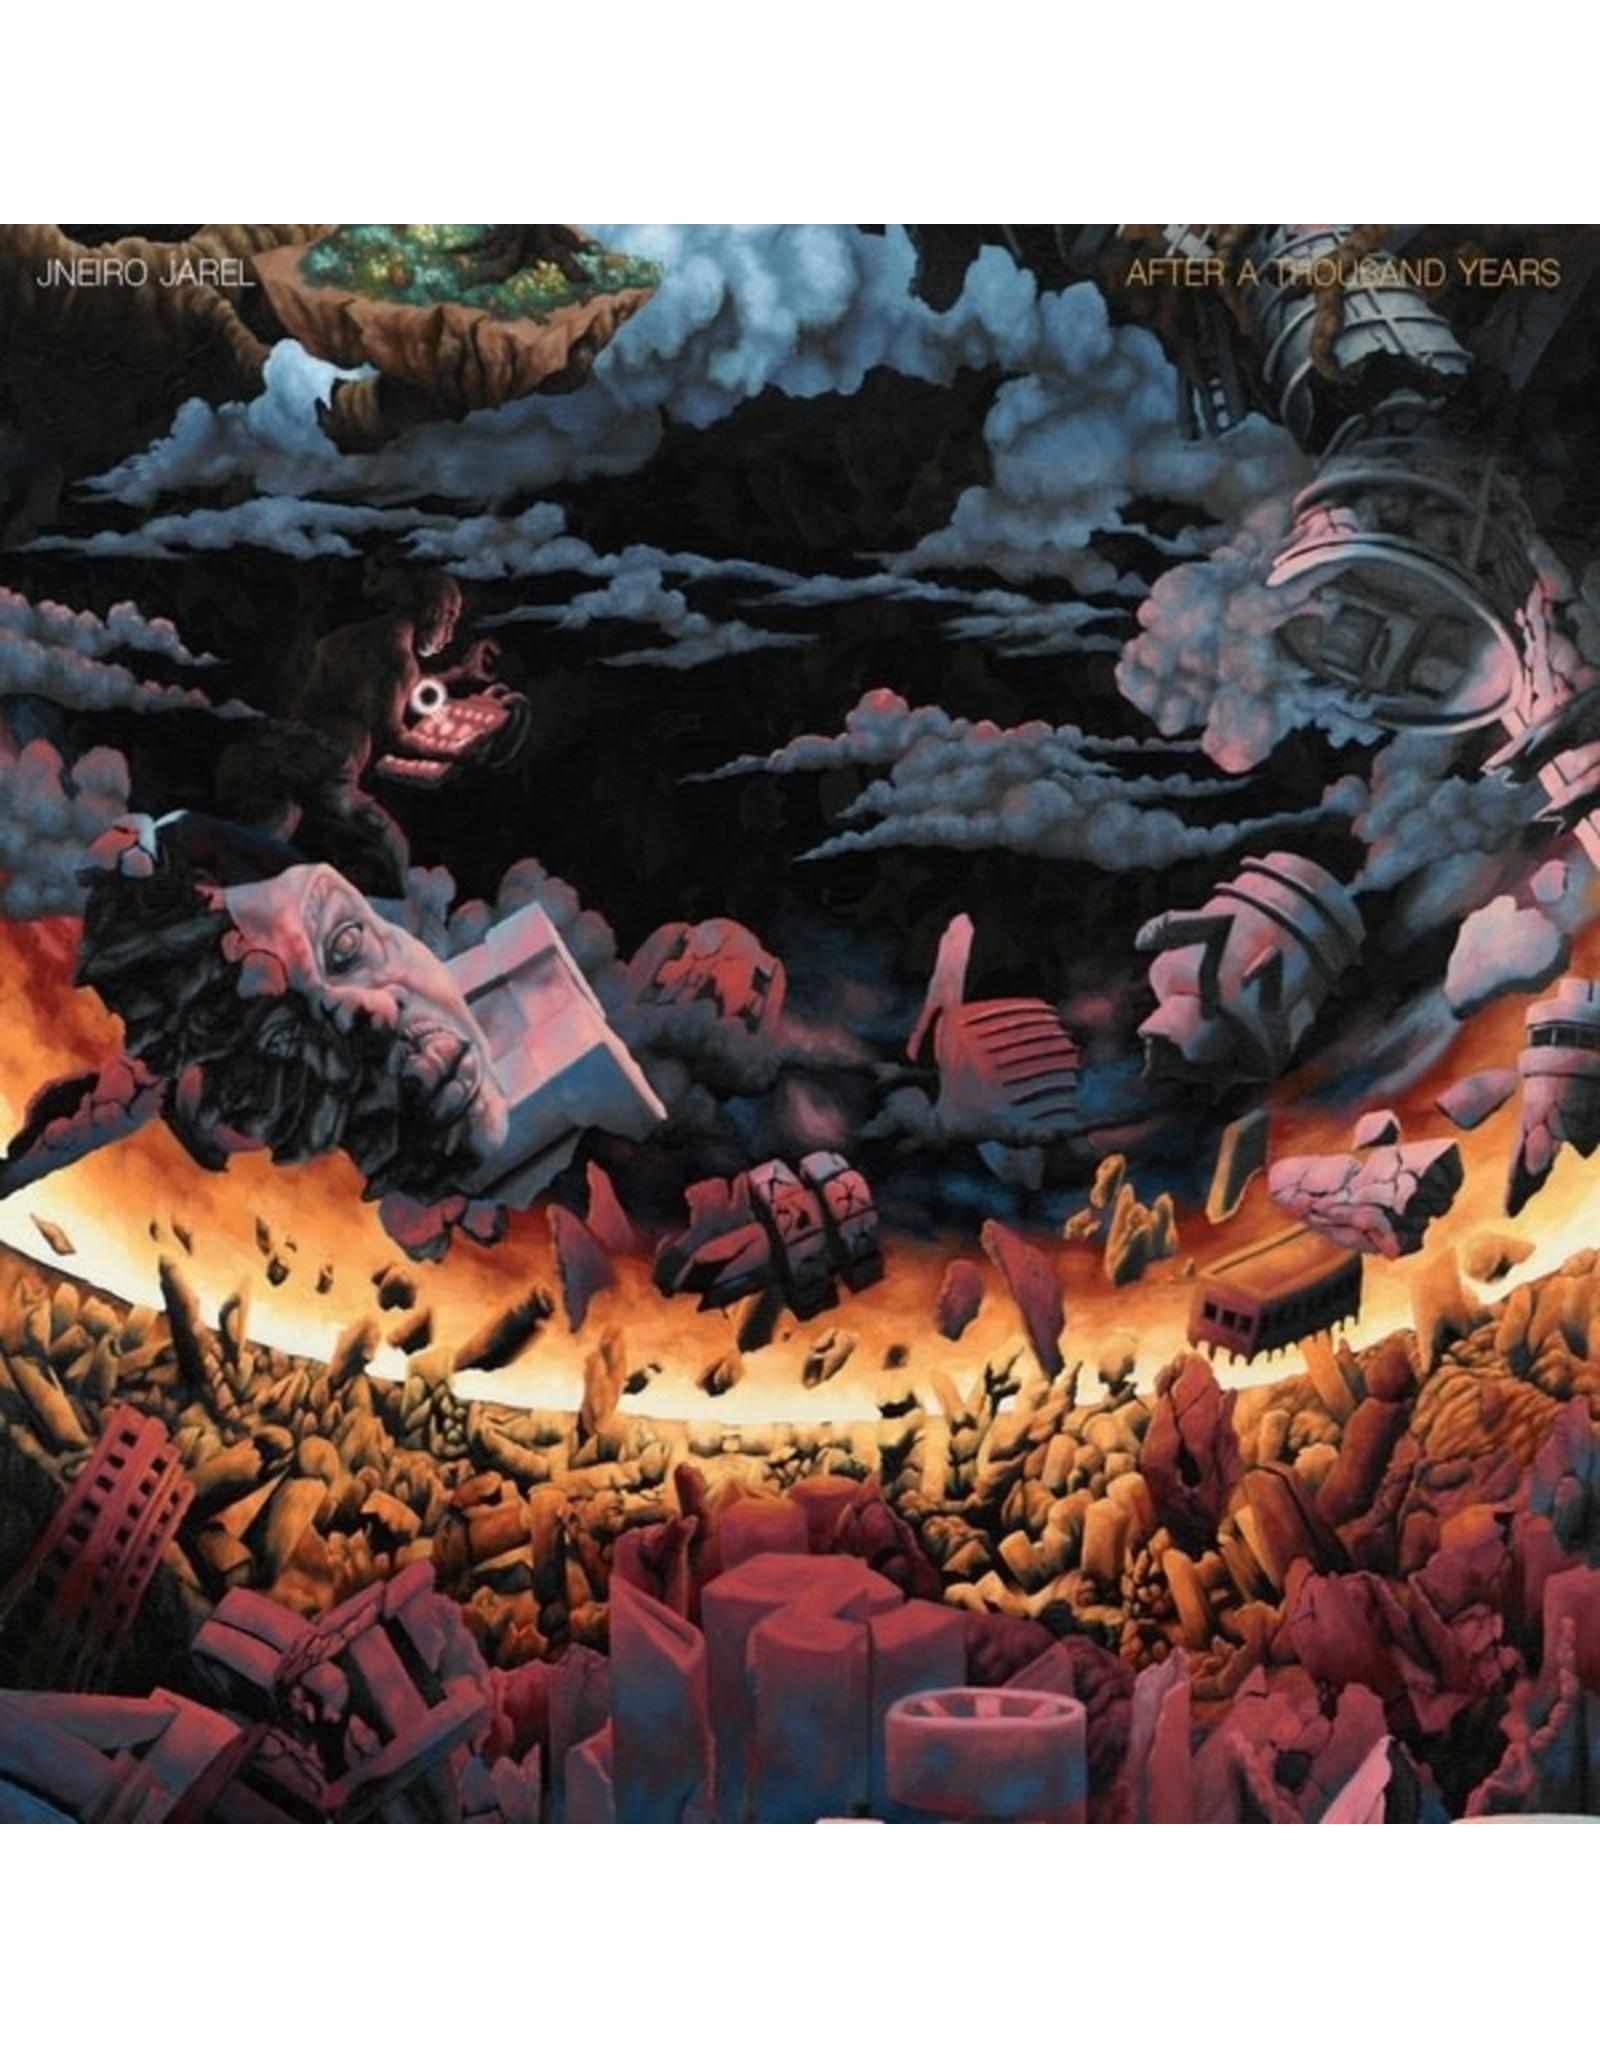 New Vinyl Jneiro Jarel - After A Thousand Years LP